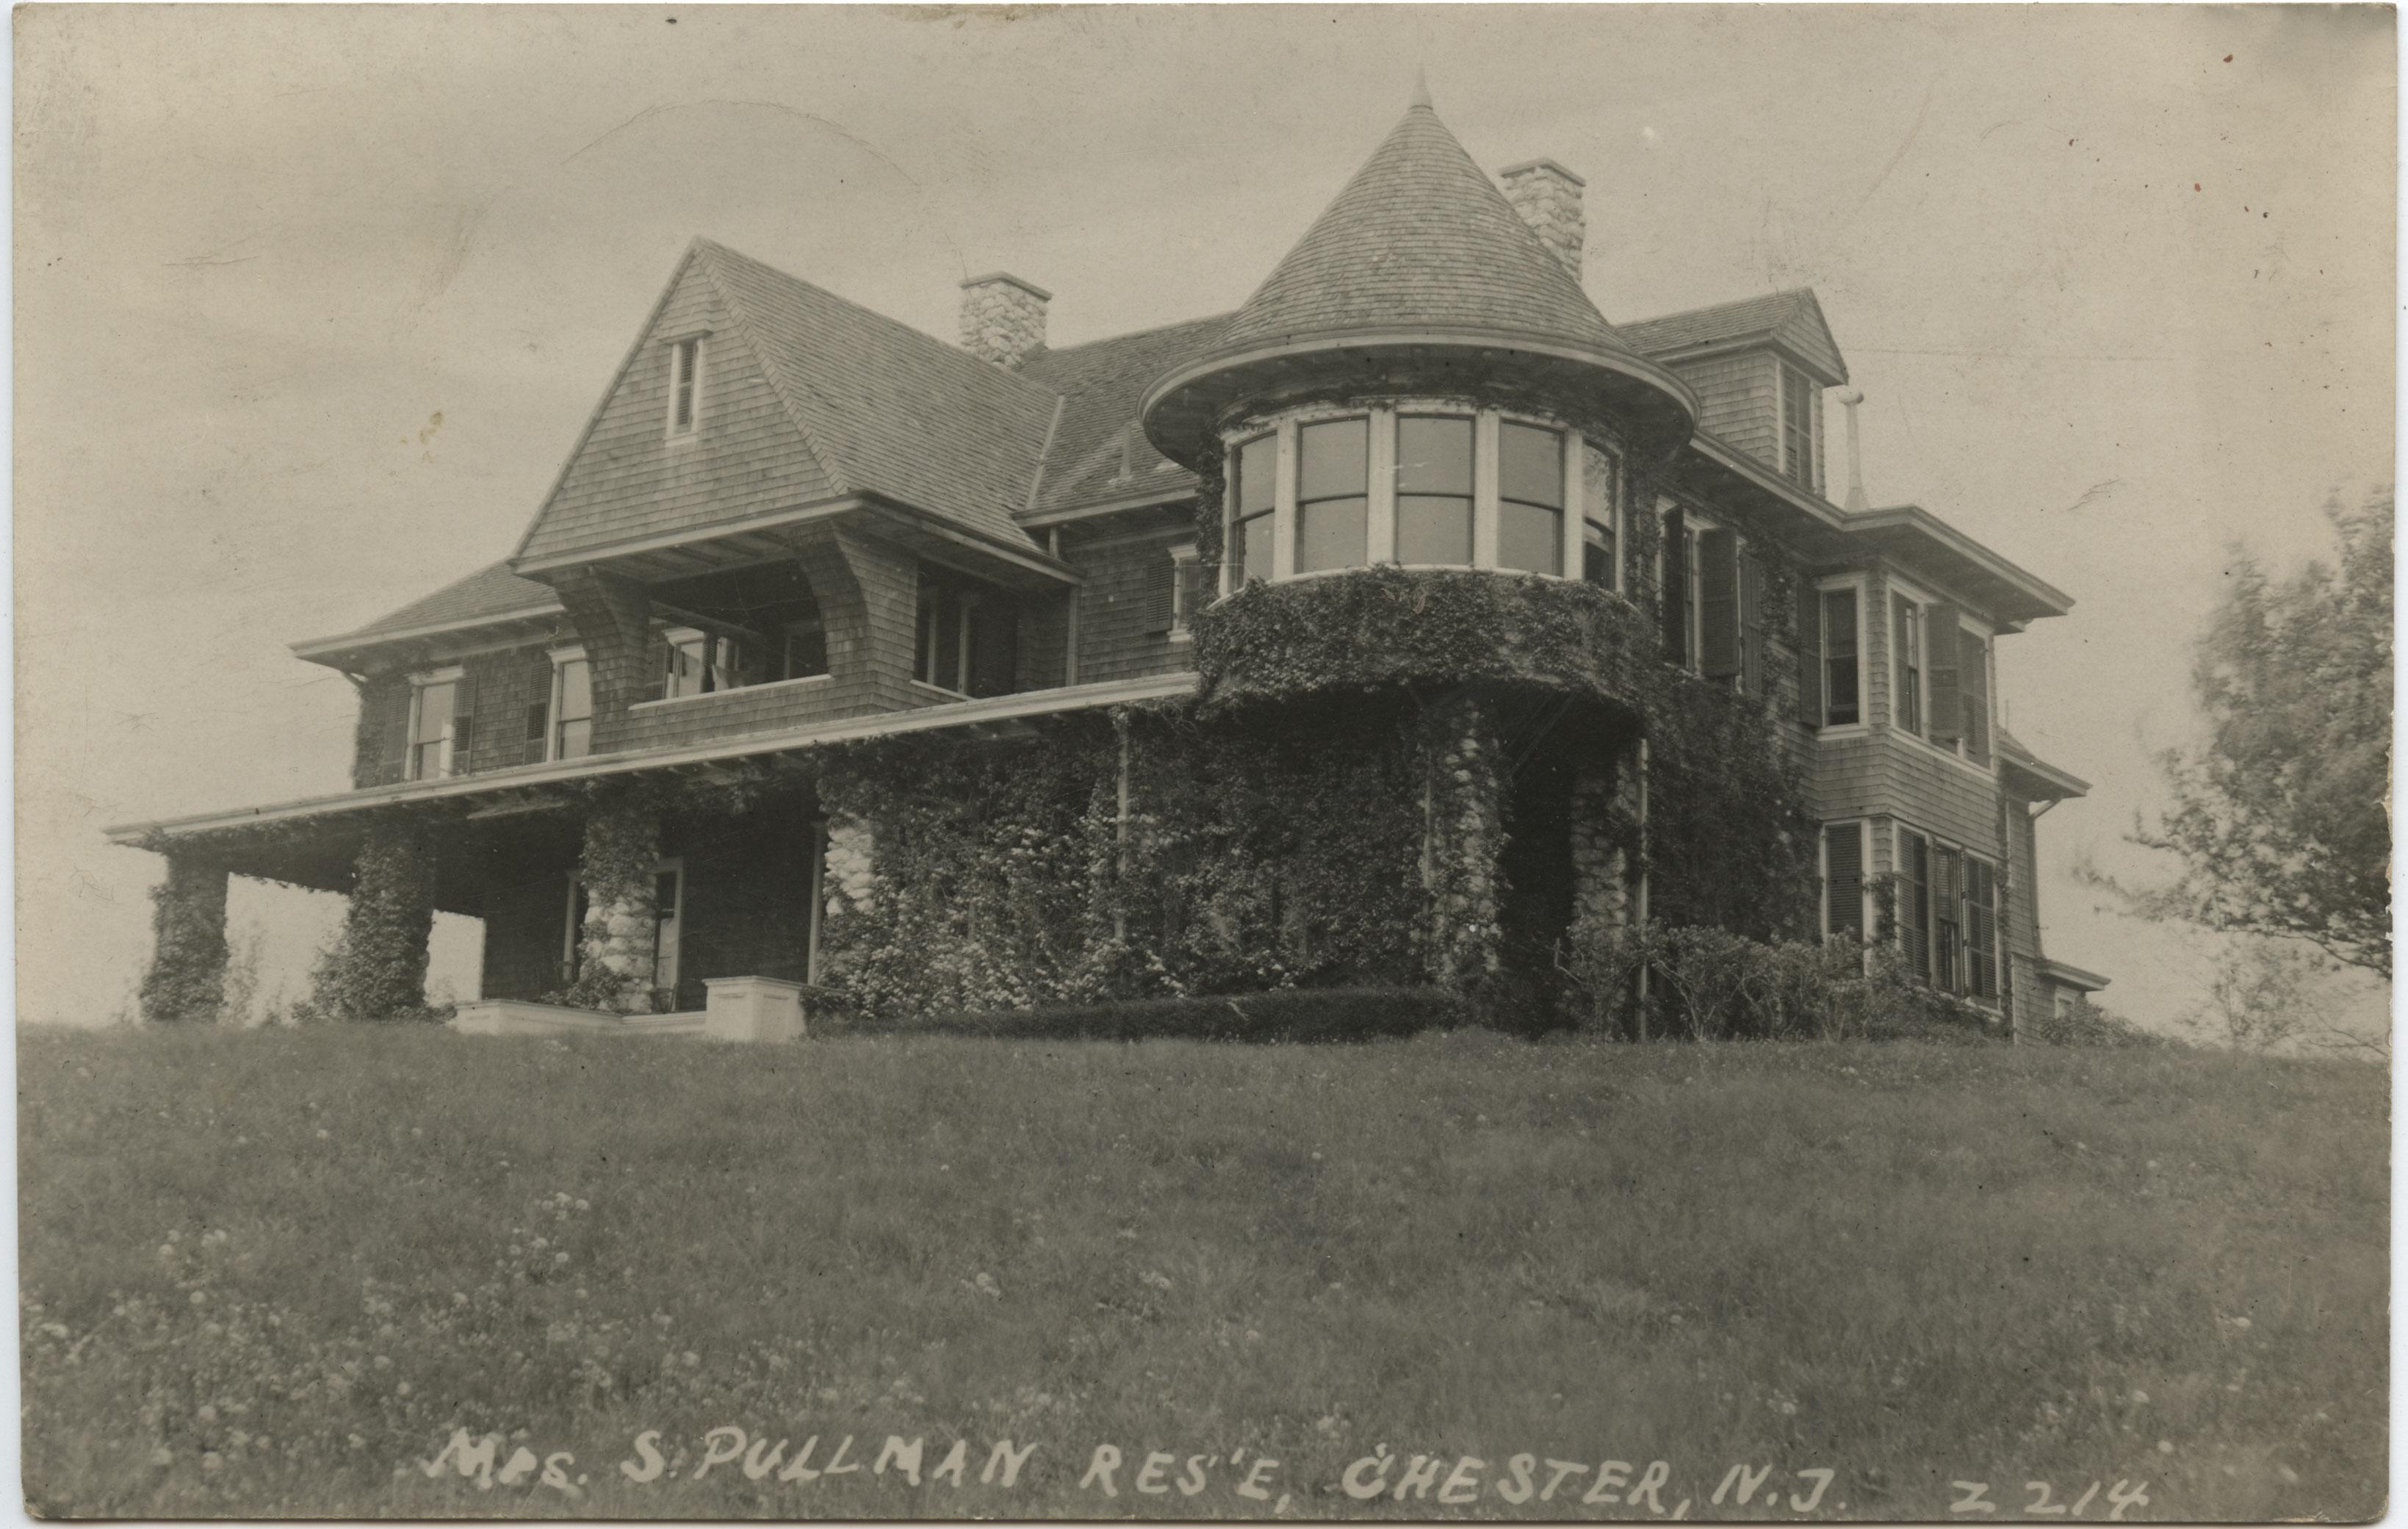 Pullman Mansion